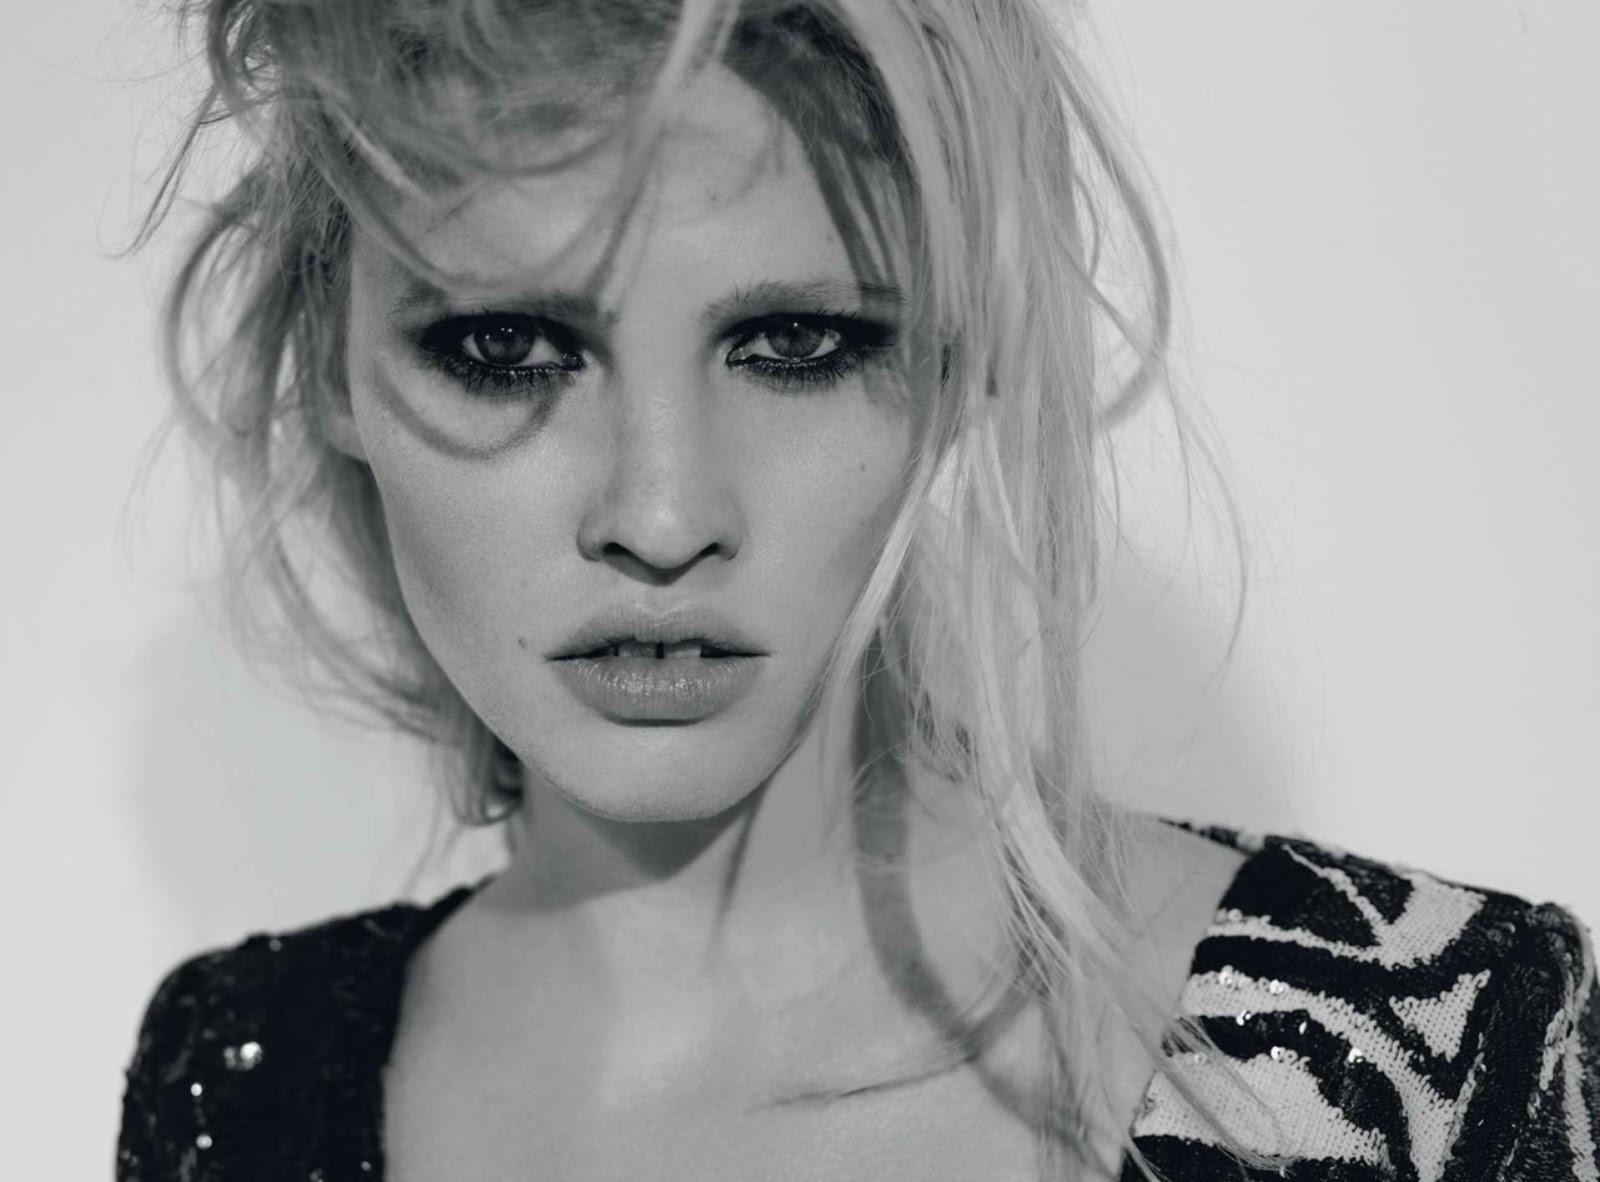 Aliya Galyautdinova nudes (88 images) Fappening, Facebook, braless